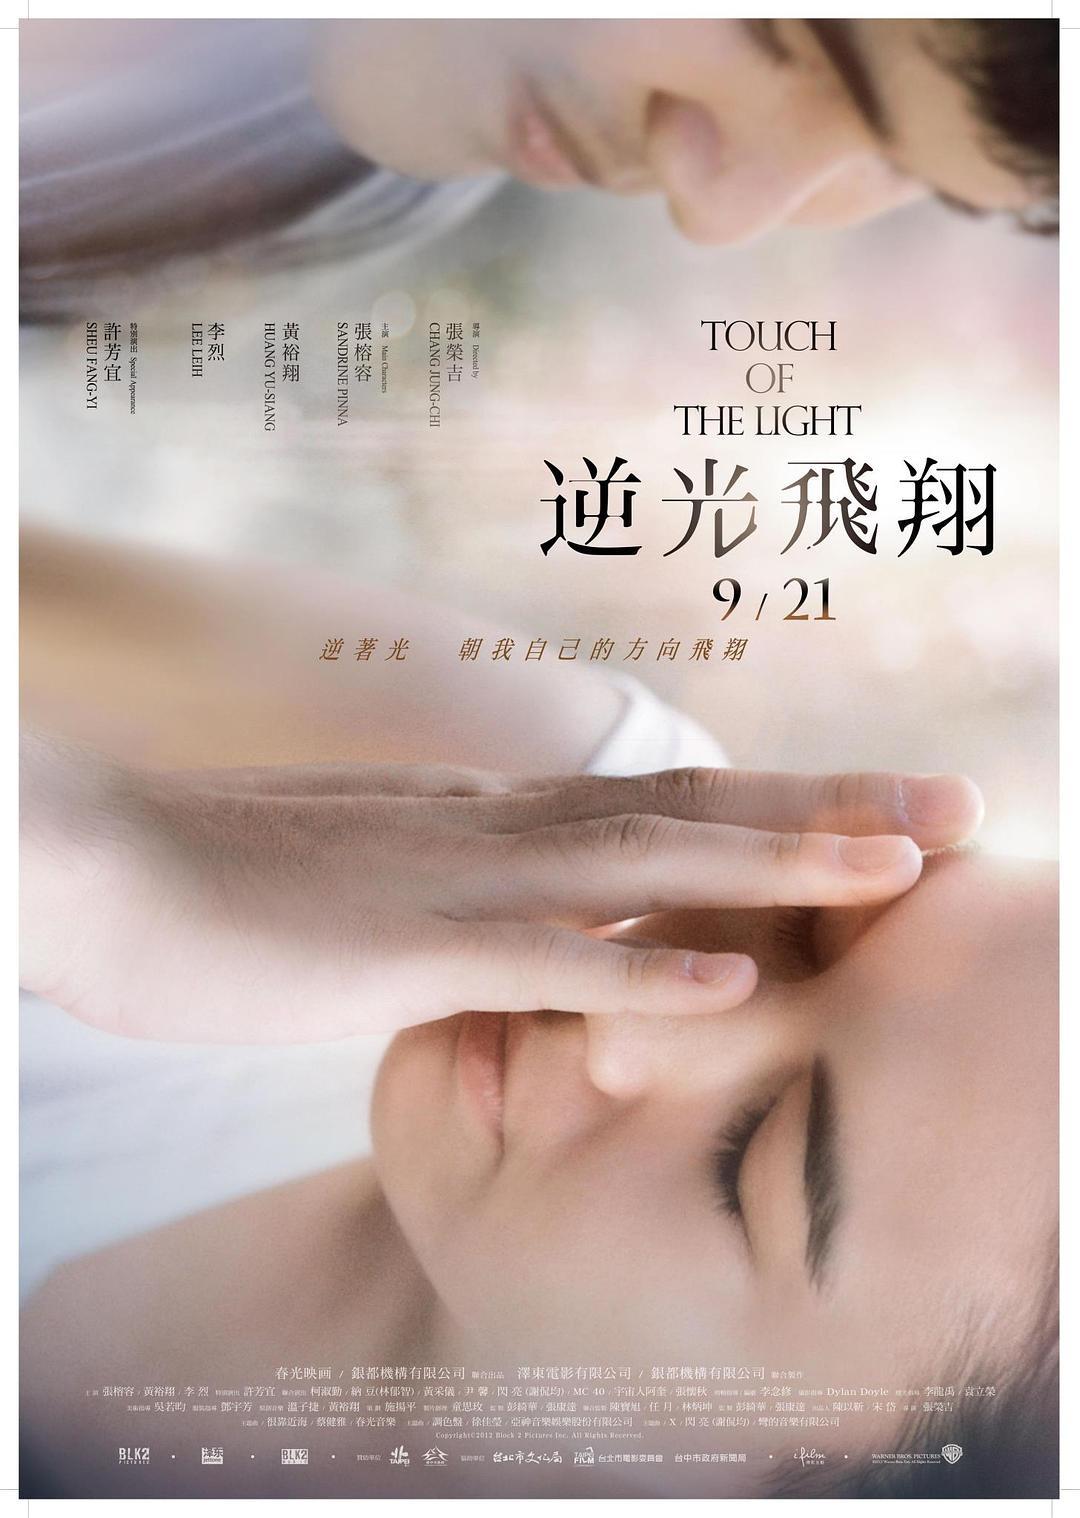 逆光飞翔 蓝光原盘下载+高清MKV版/Touch of the Light 2012 10.1G